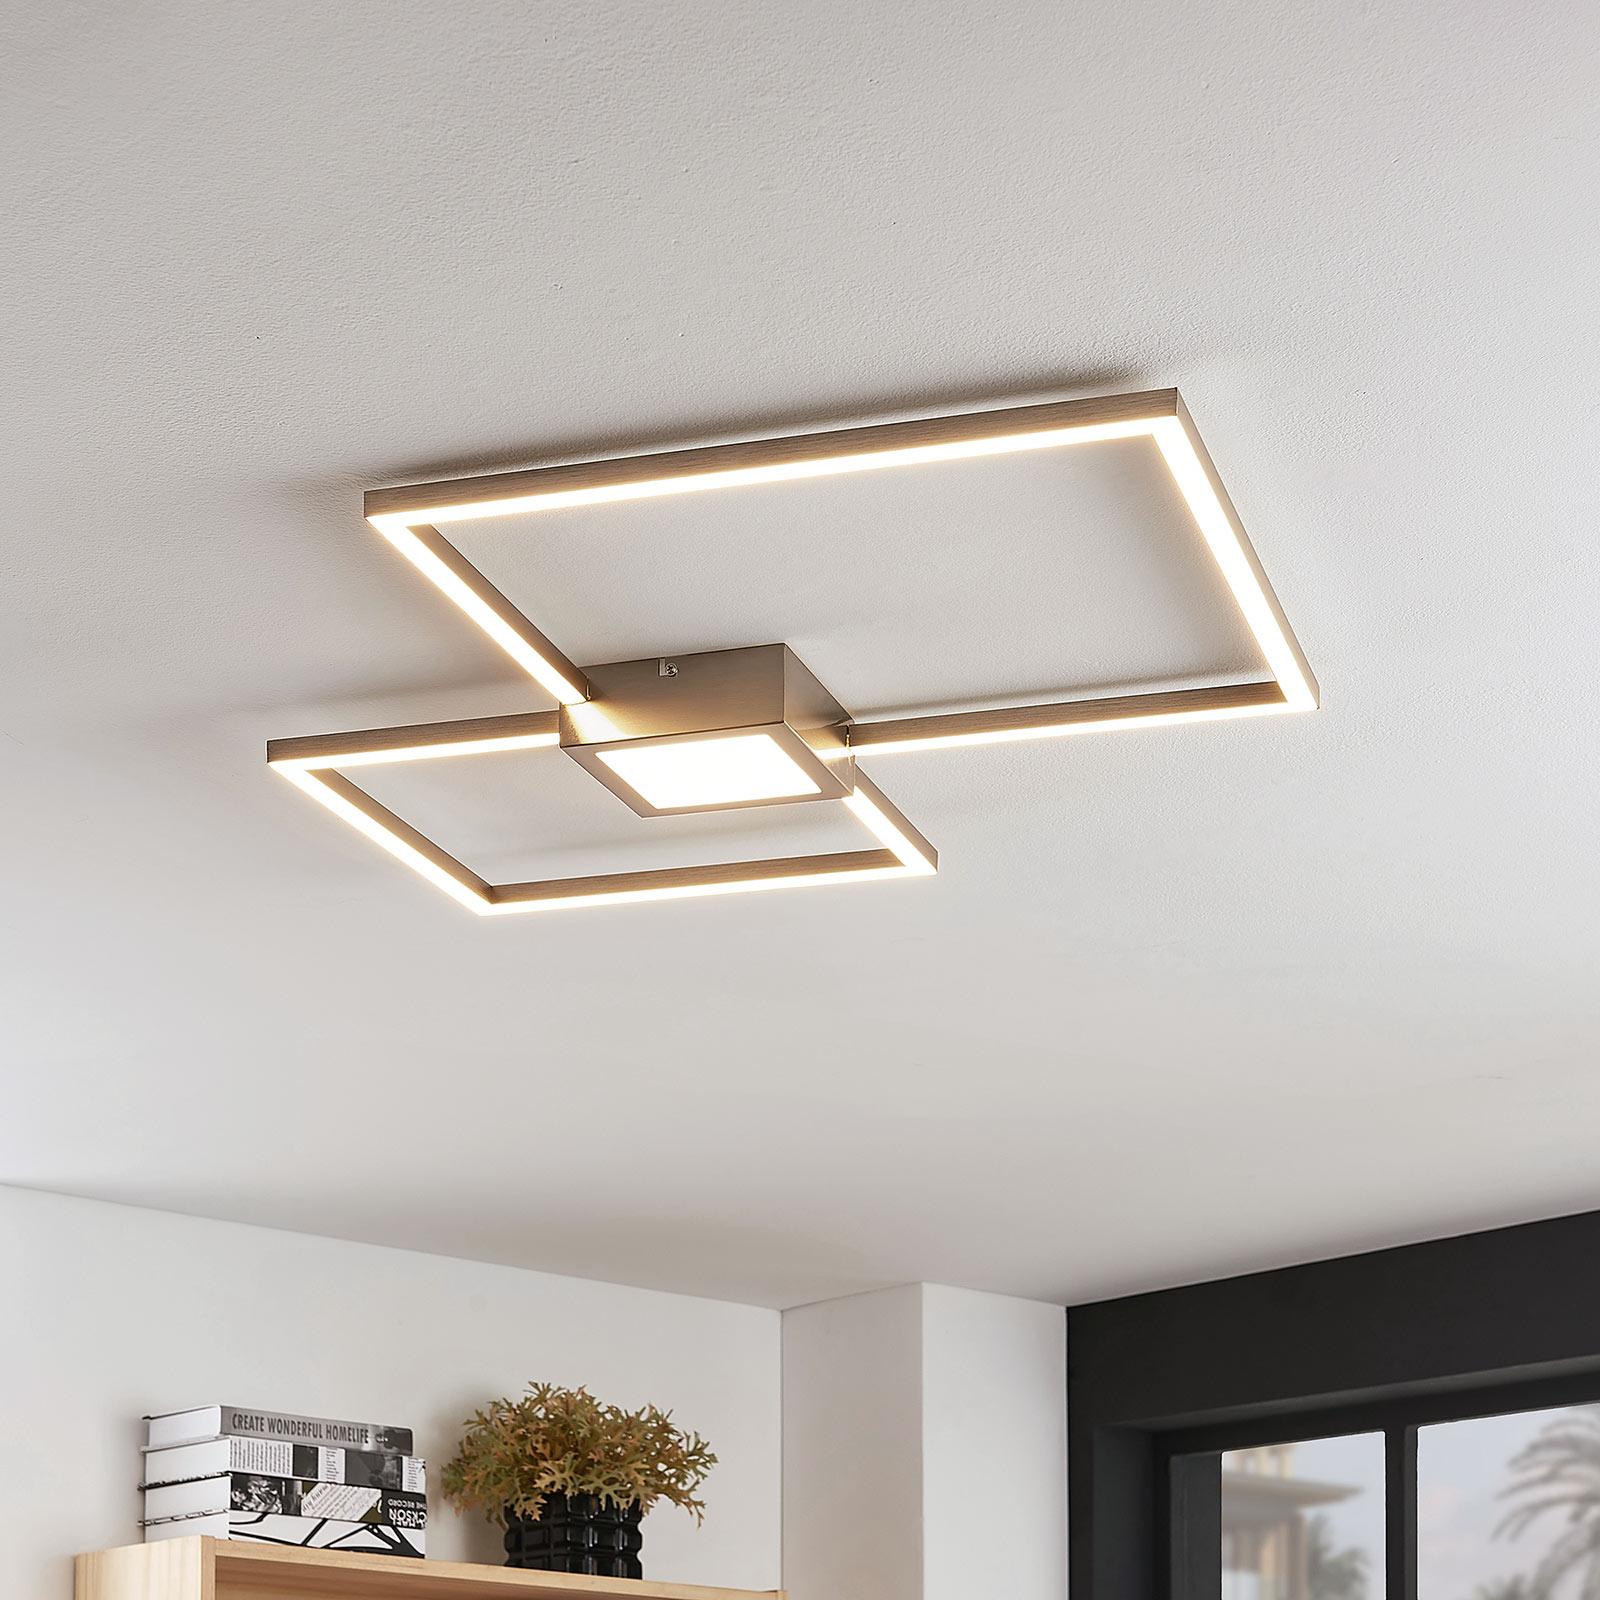 LED-loftlampe Duetto, kvadrater